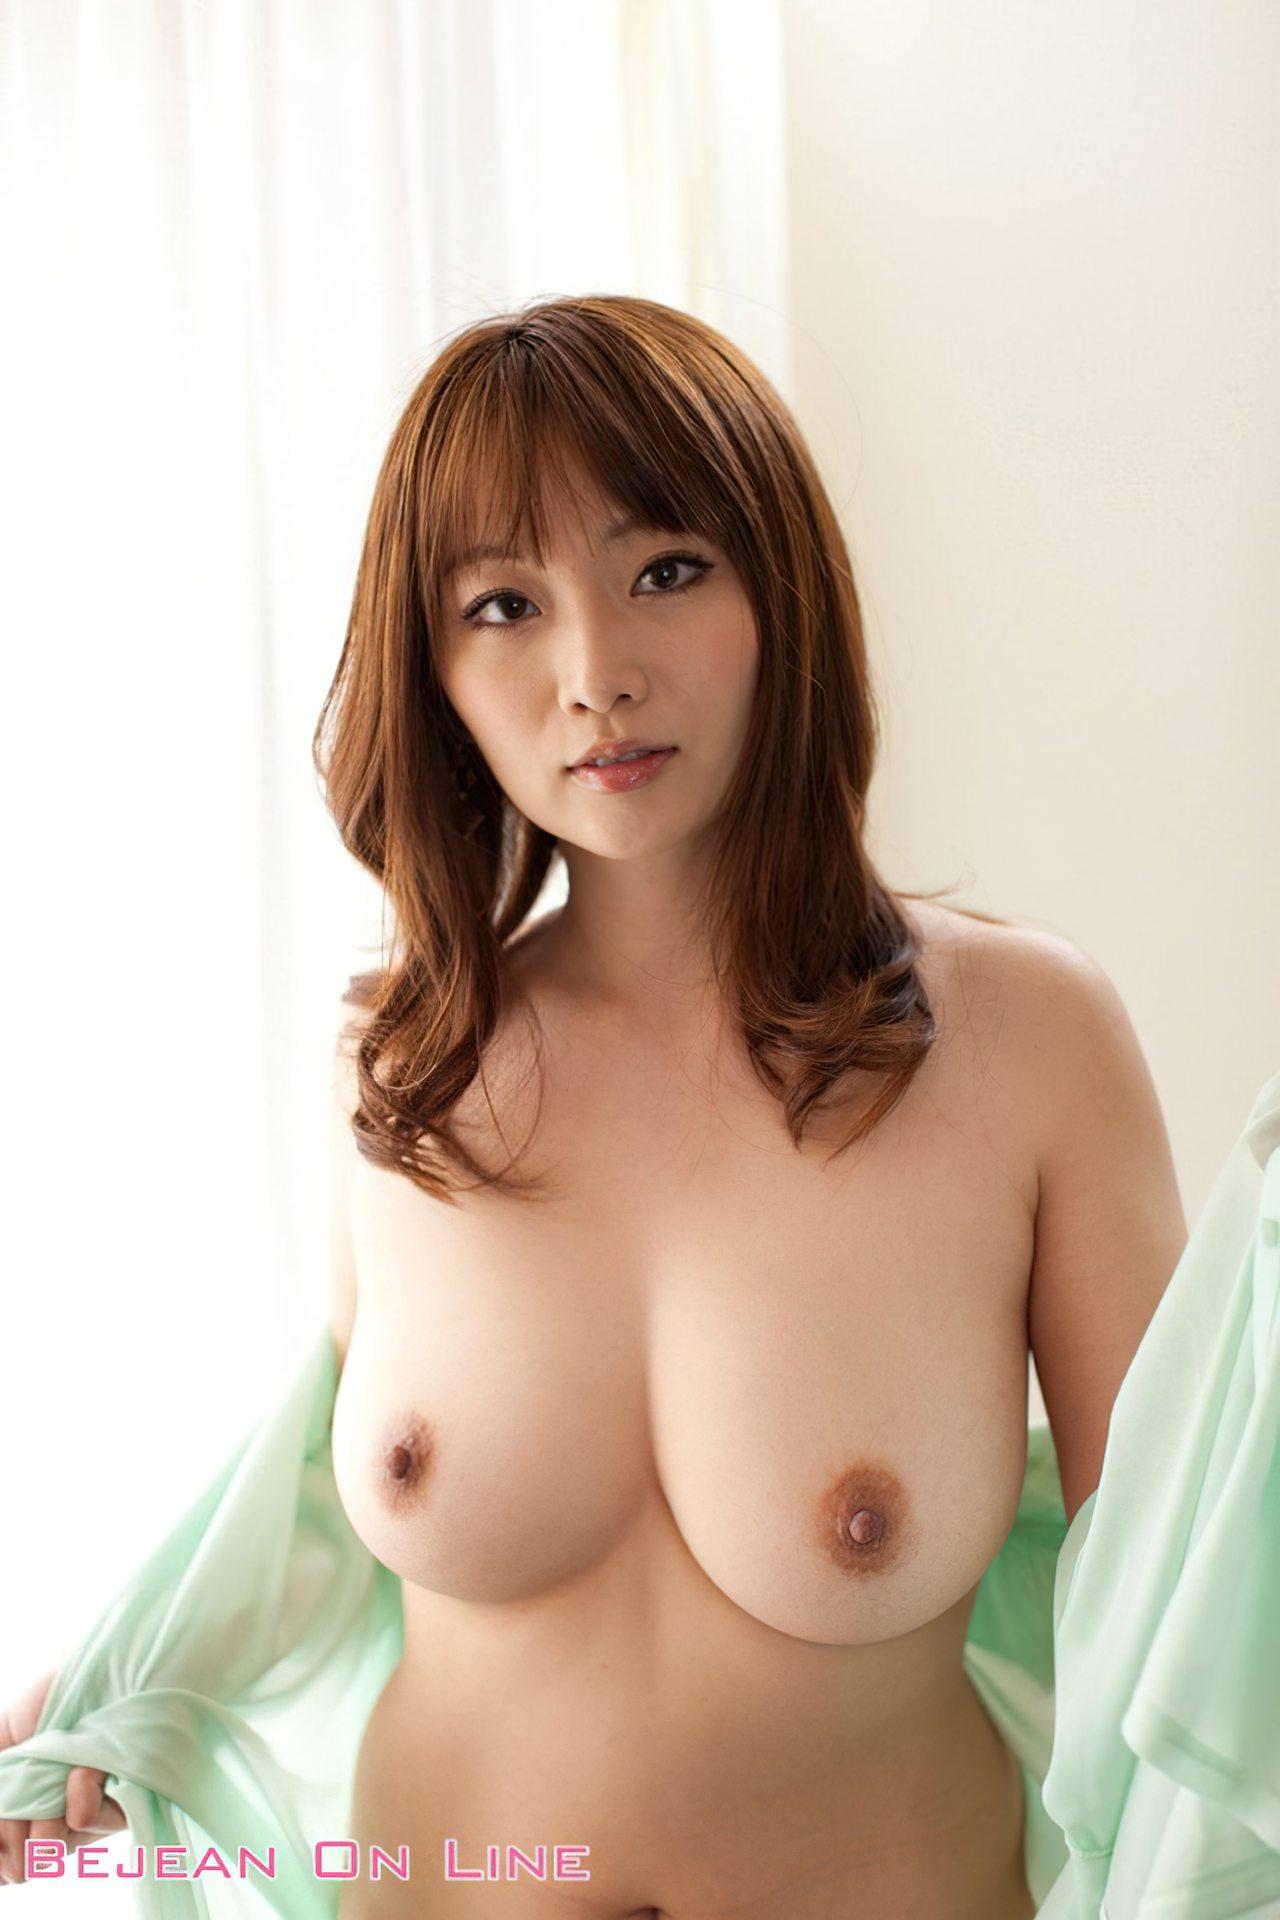 Japonesa Safada (10)